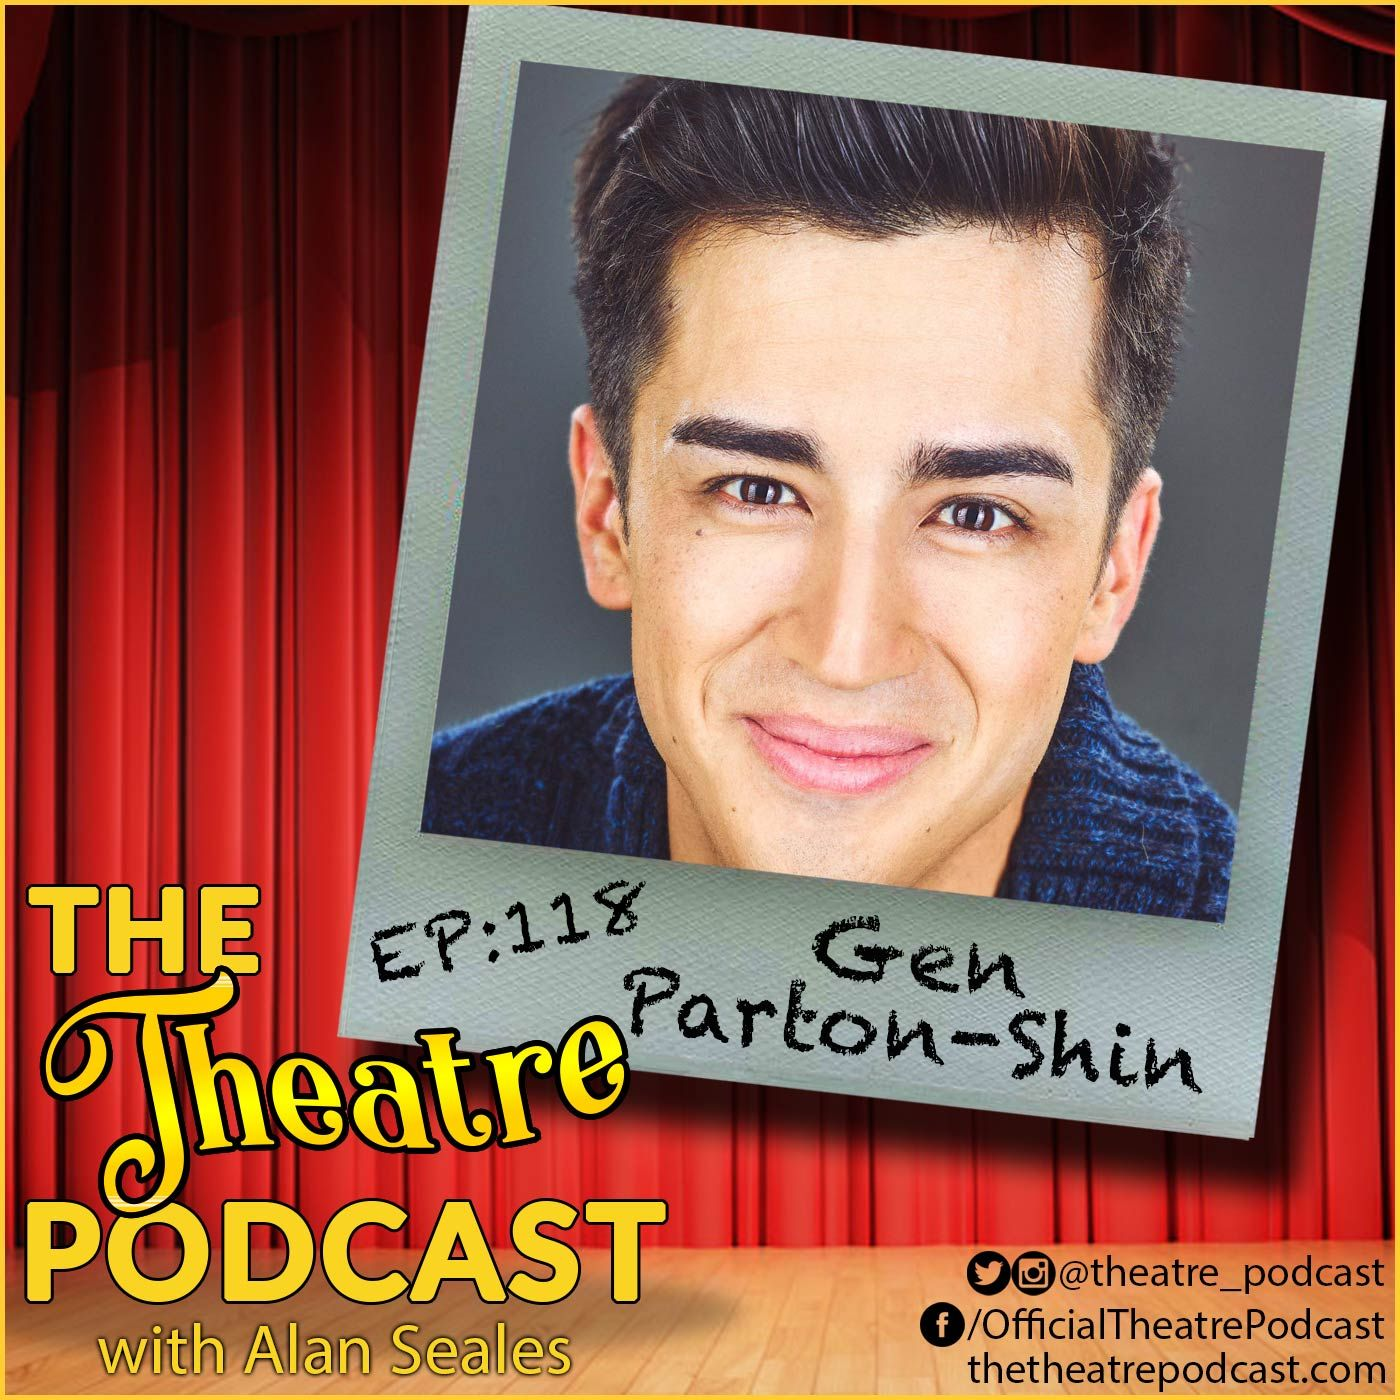 Ep118 - Gen Parton-Shin: Bridging the Gap Between Japan and Broadway